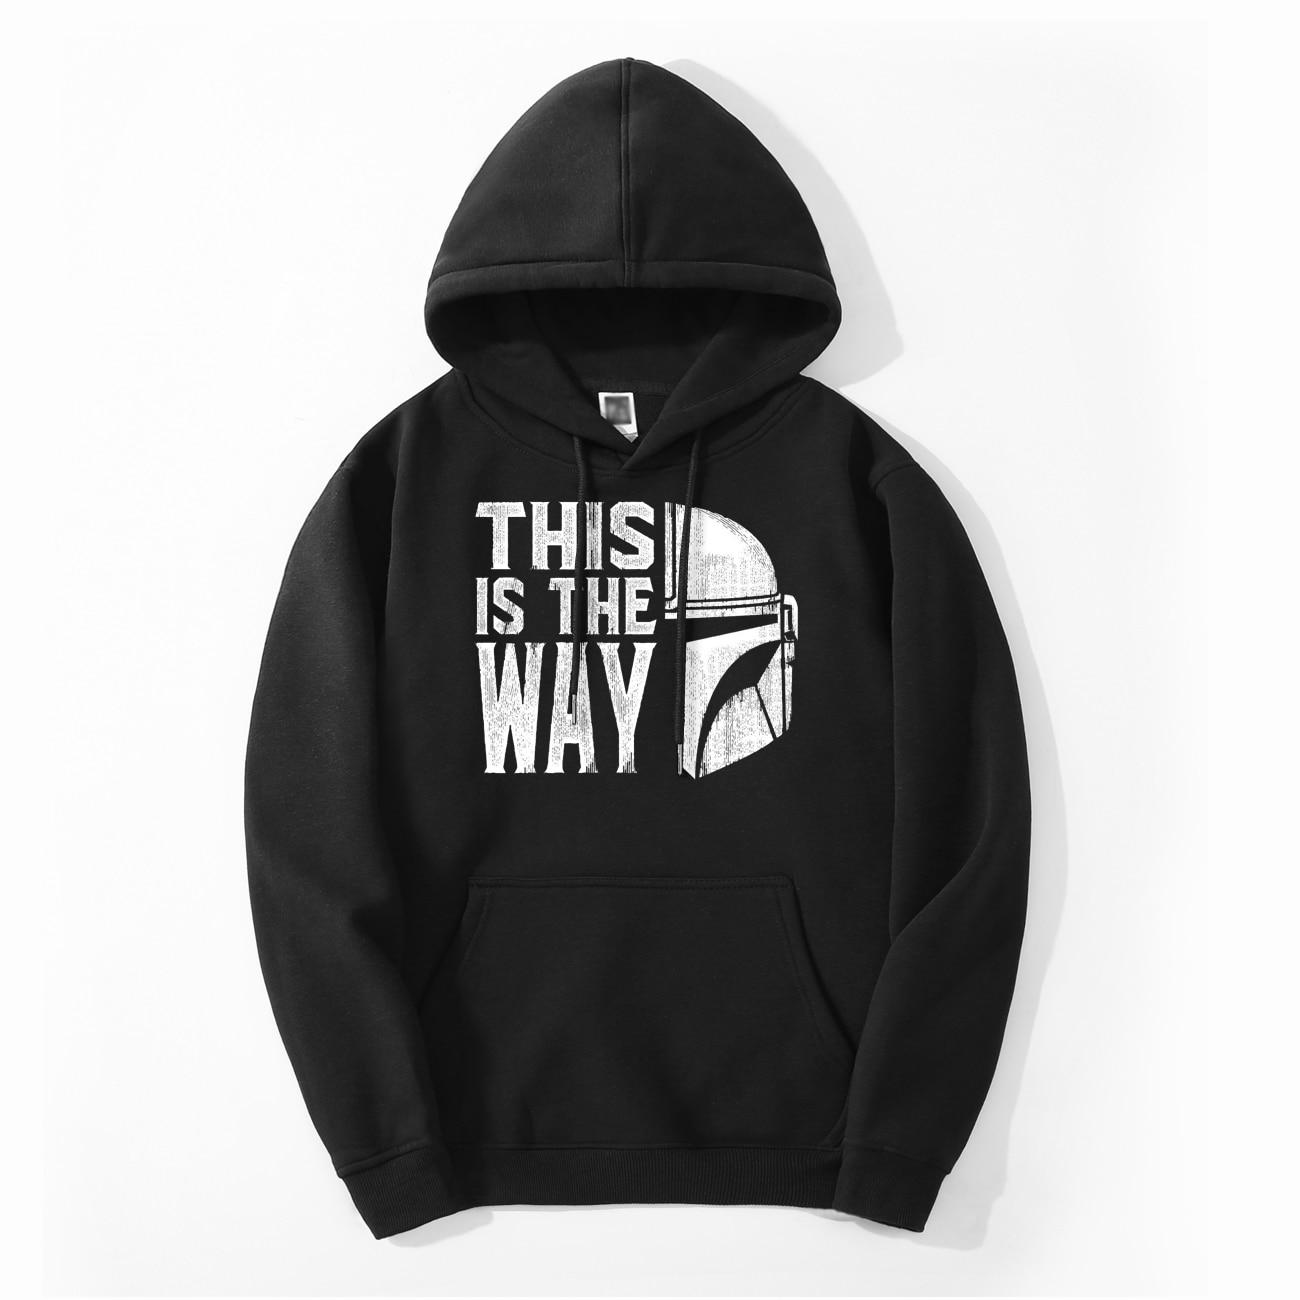 TV Show The Mandalorian Way Men Hoodies Sweatshirt Fleece Autumn Winter Star Wars This Is My Way Streetwear Warm Funny Hoody